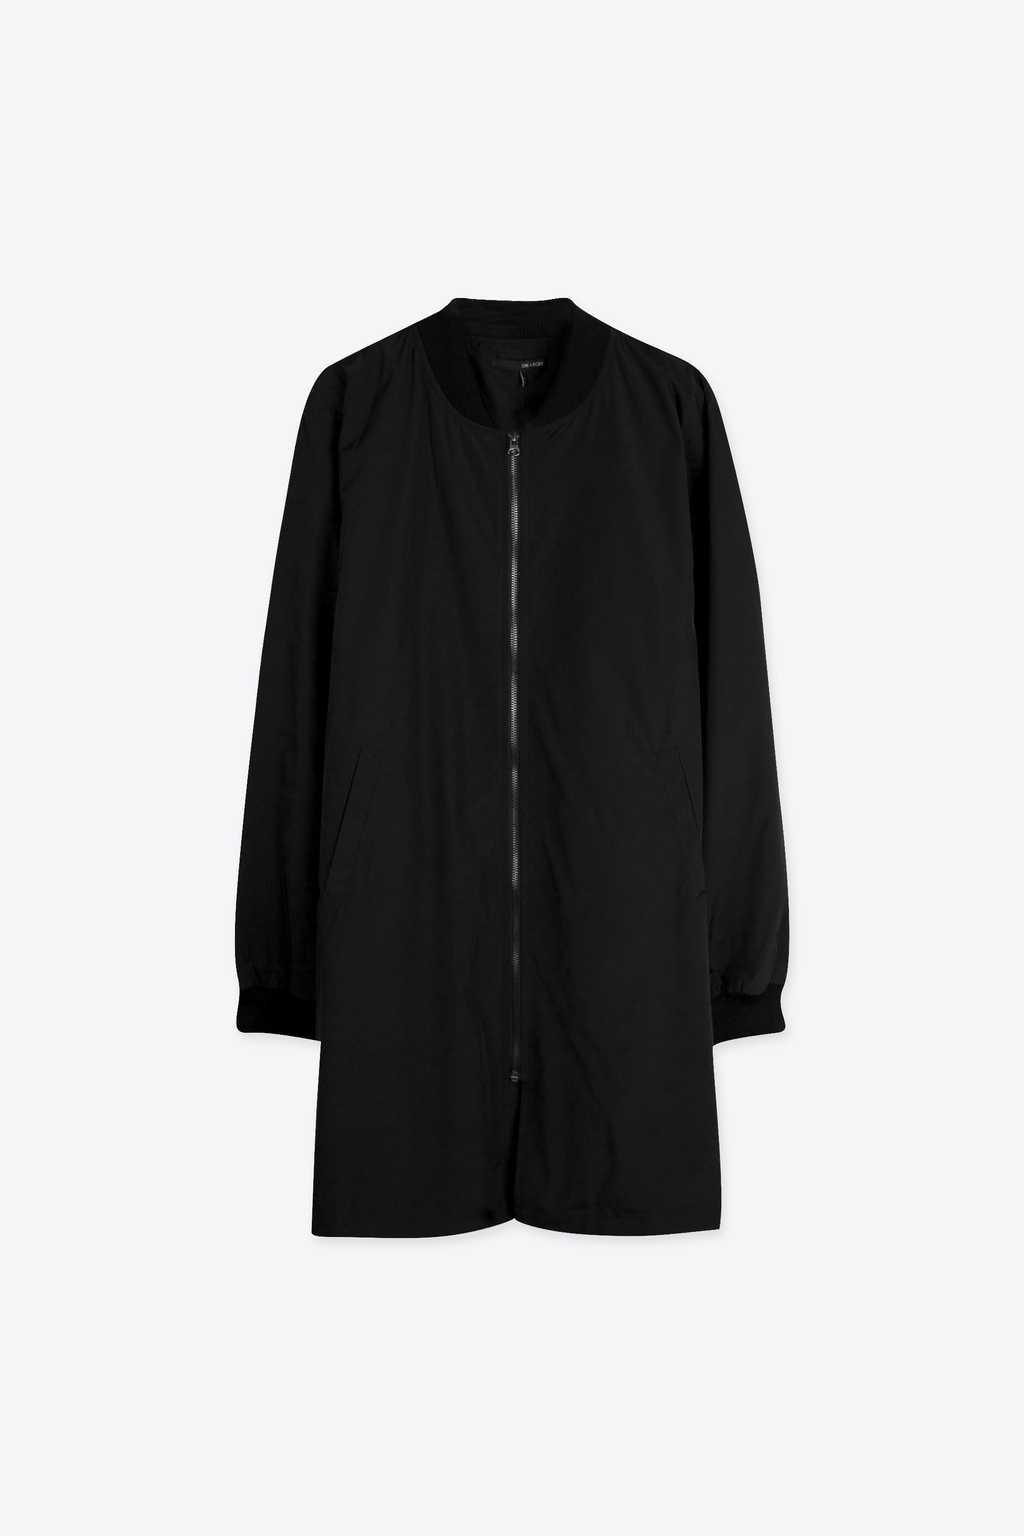 Jacket G004 Black 5